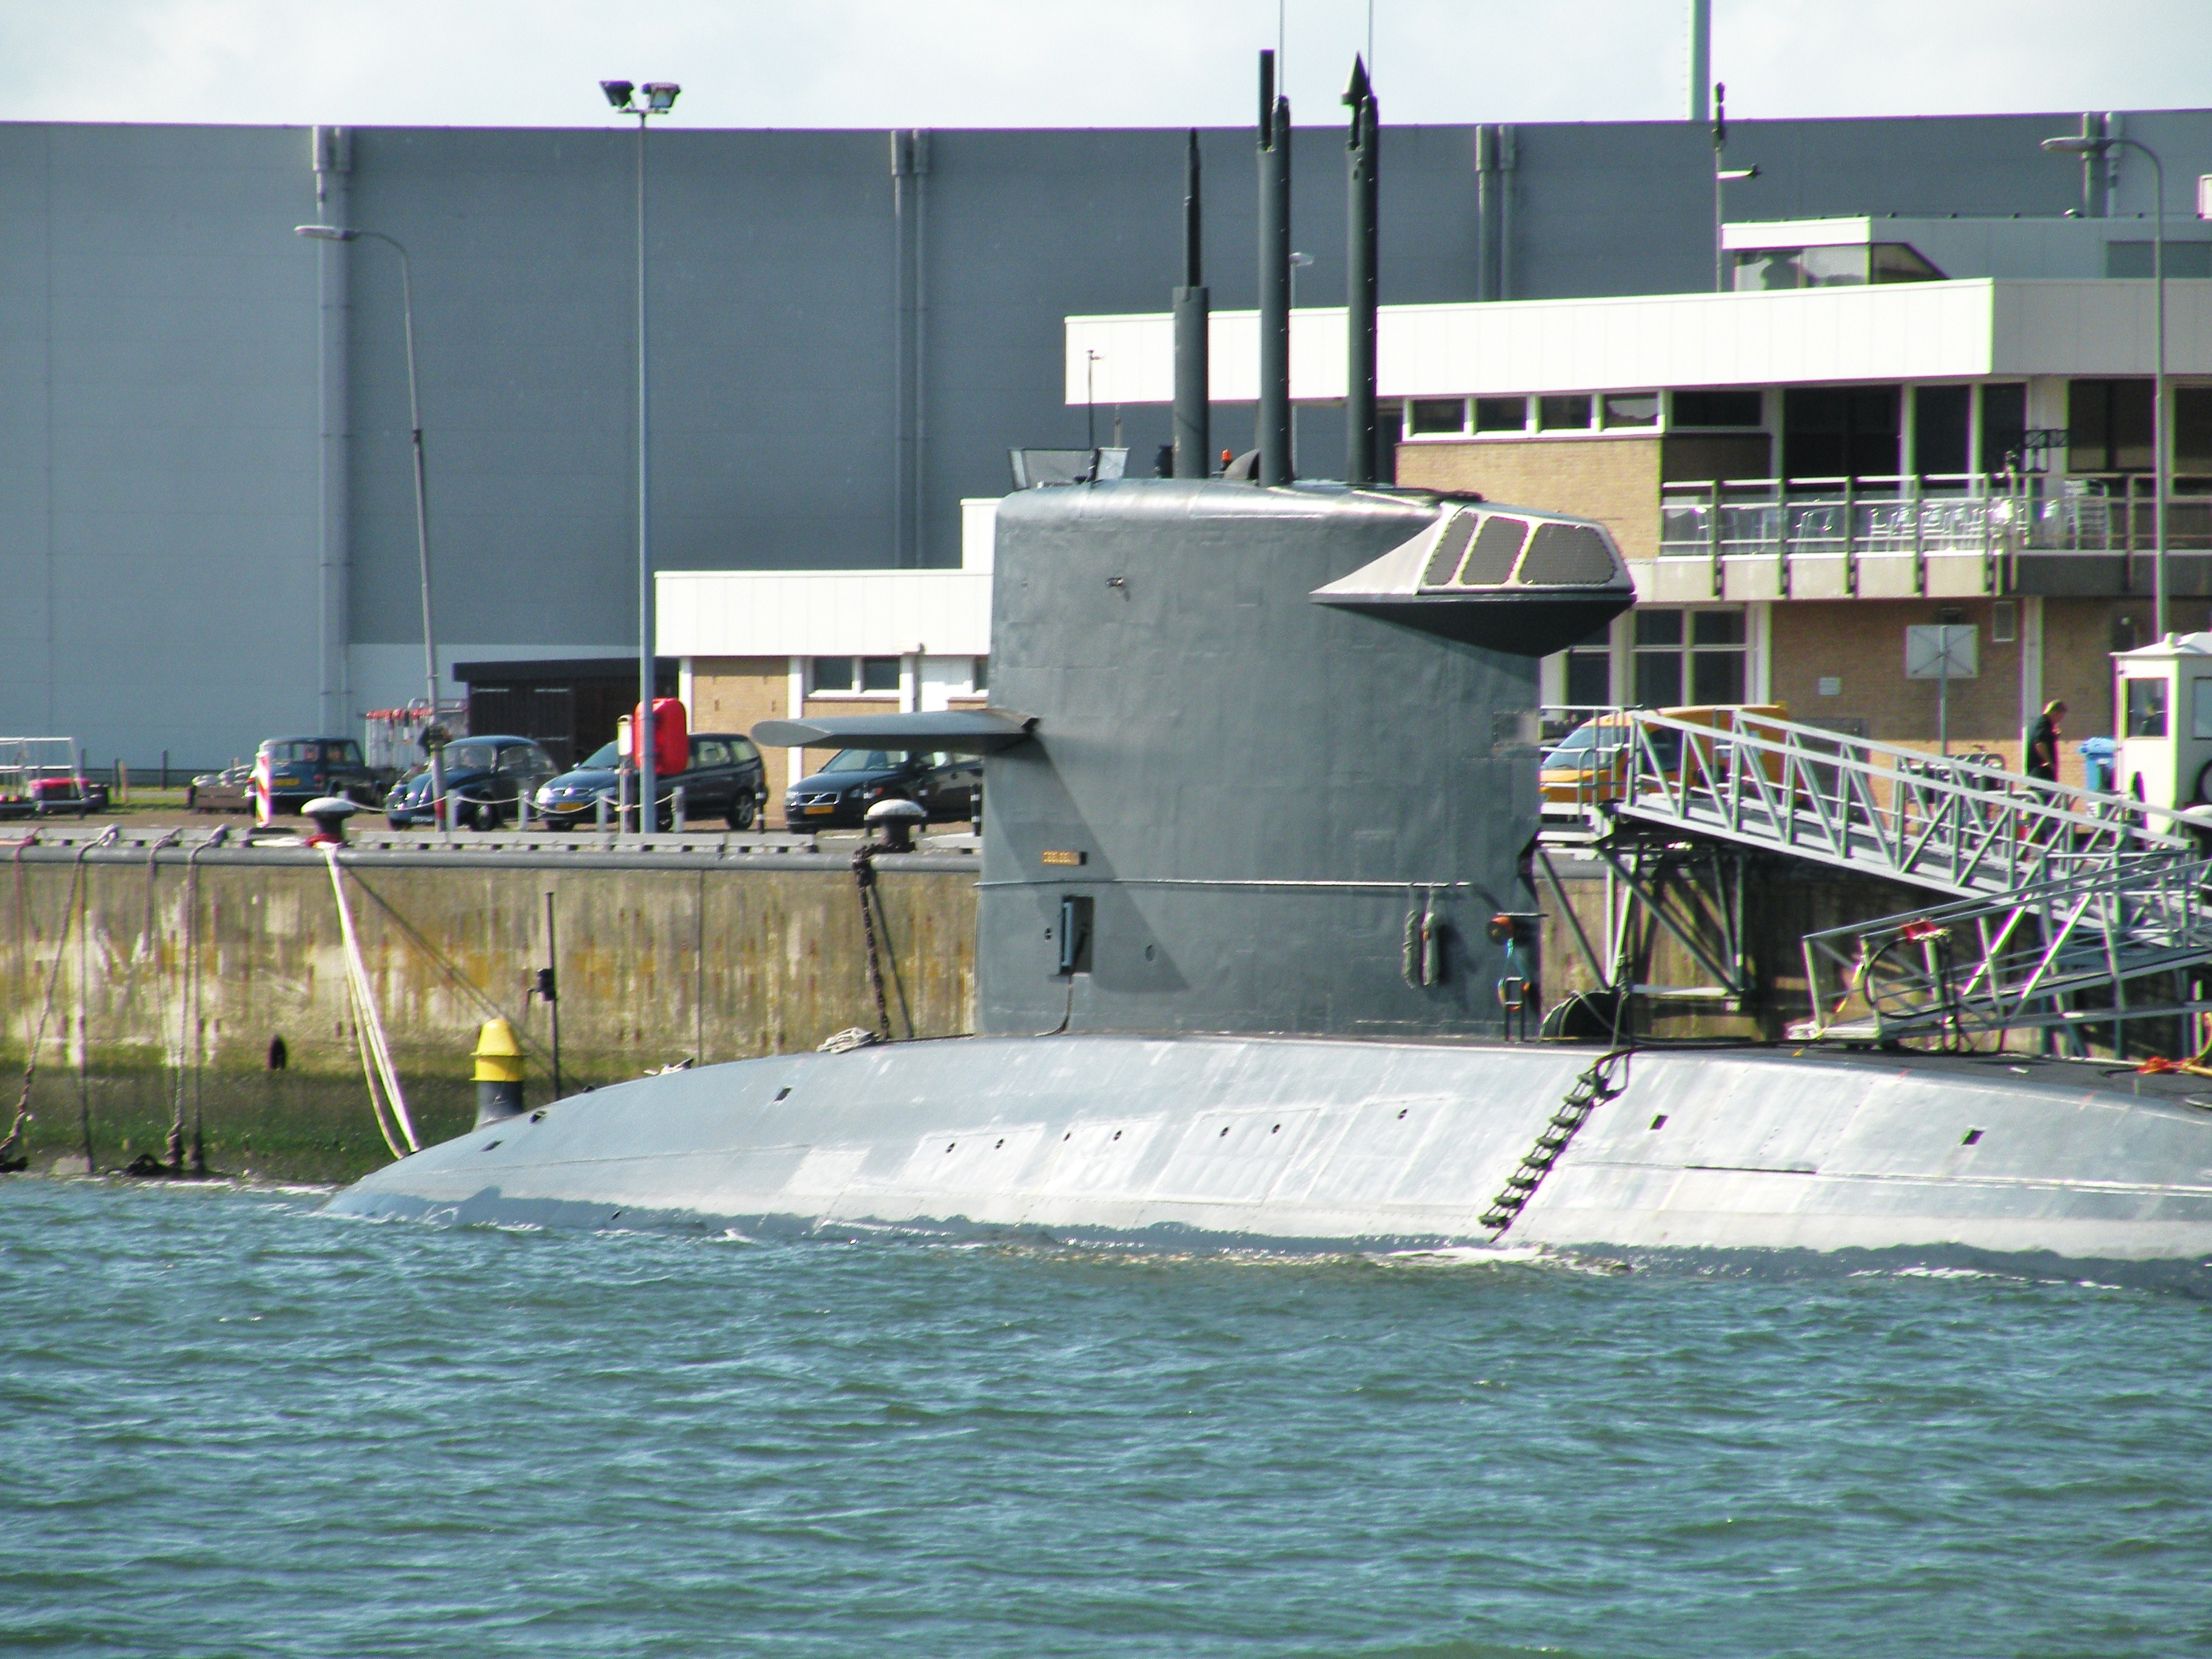 File:Den Helder, Marinehaven, onderzeeër.jpg - Wikimedia ...